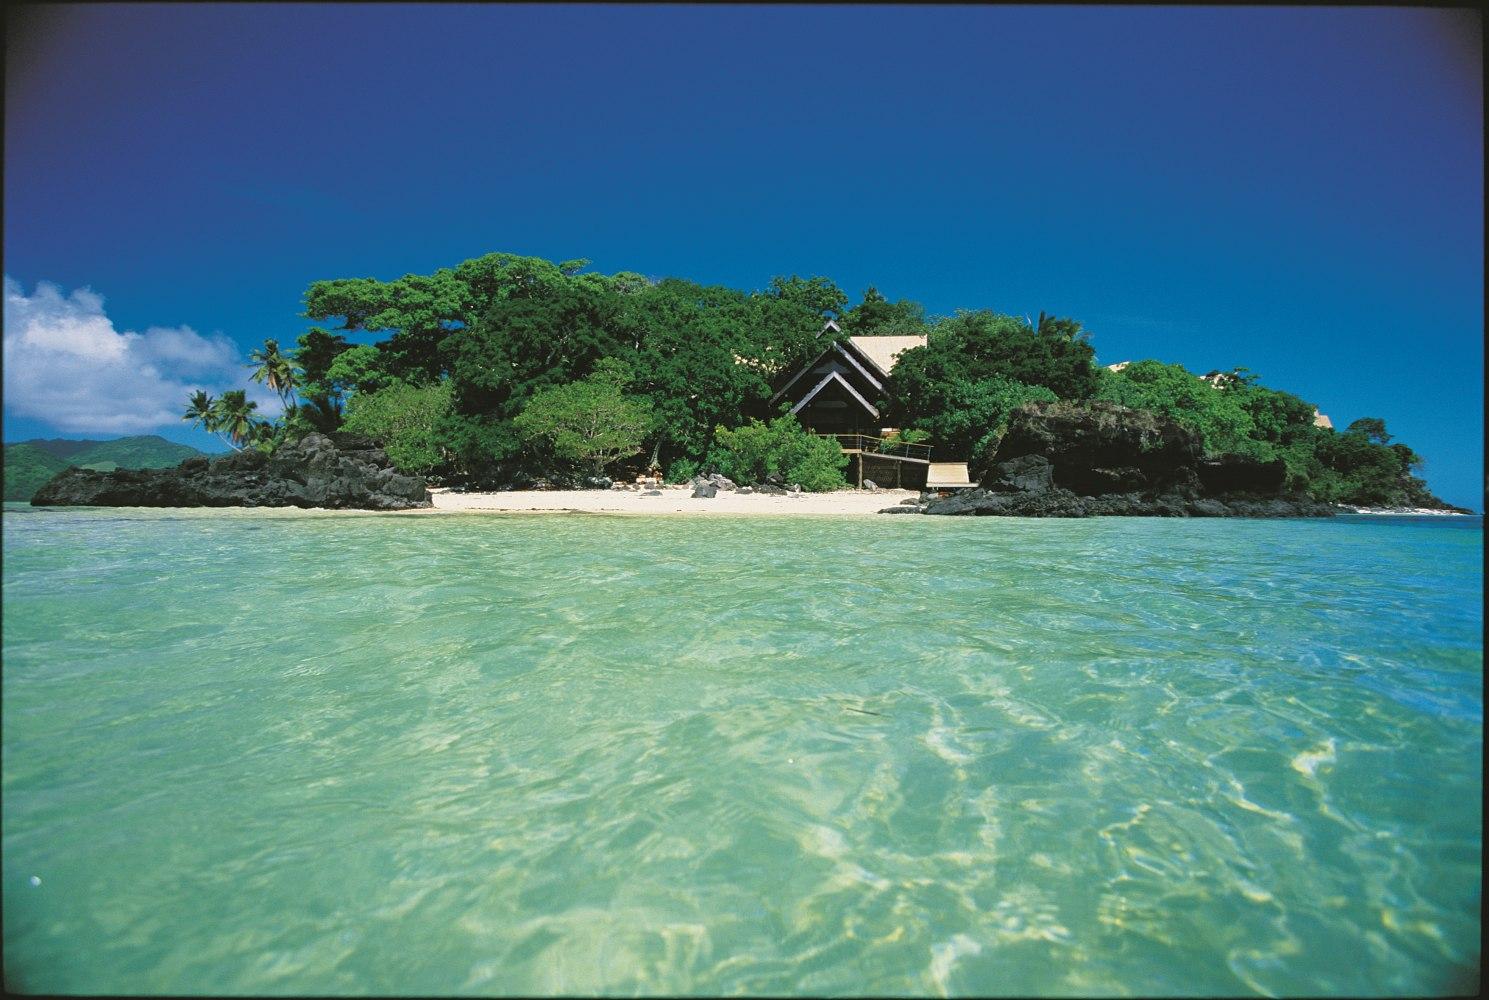 Blue Pacific Property Management